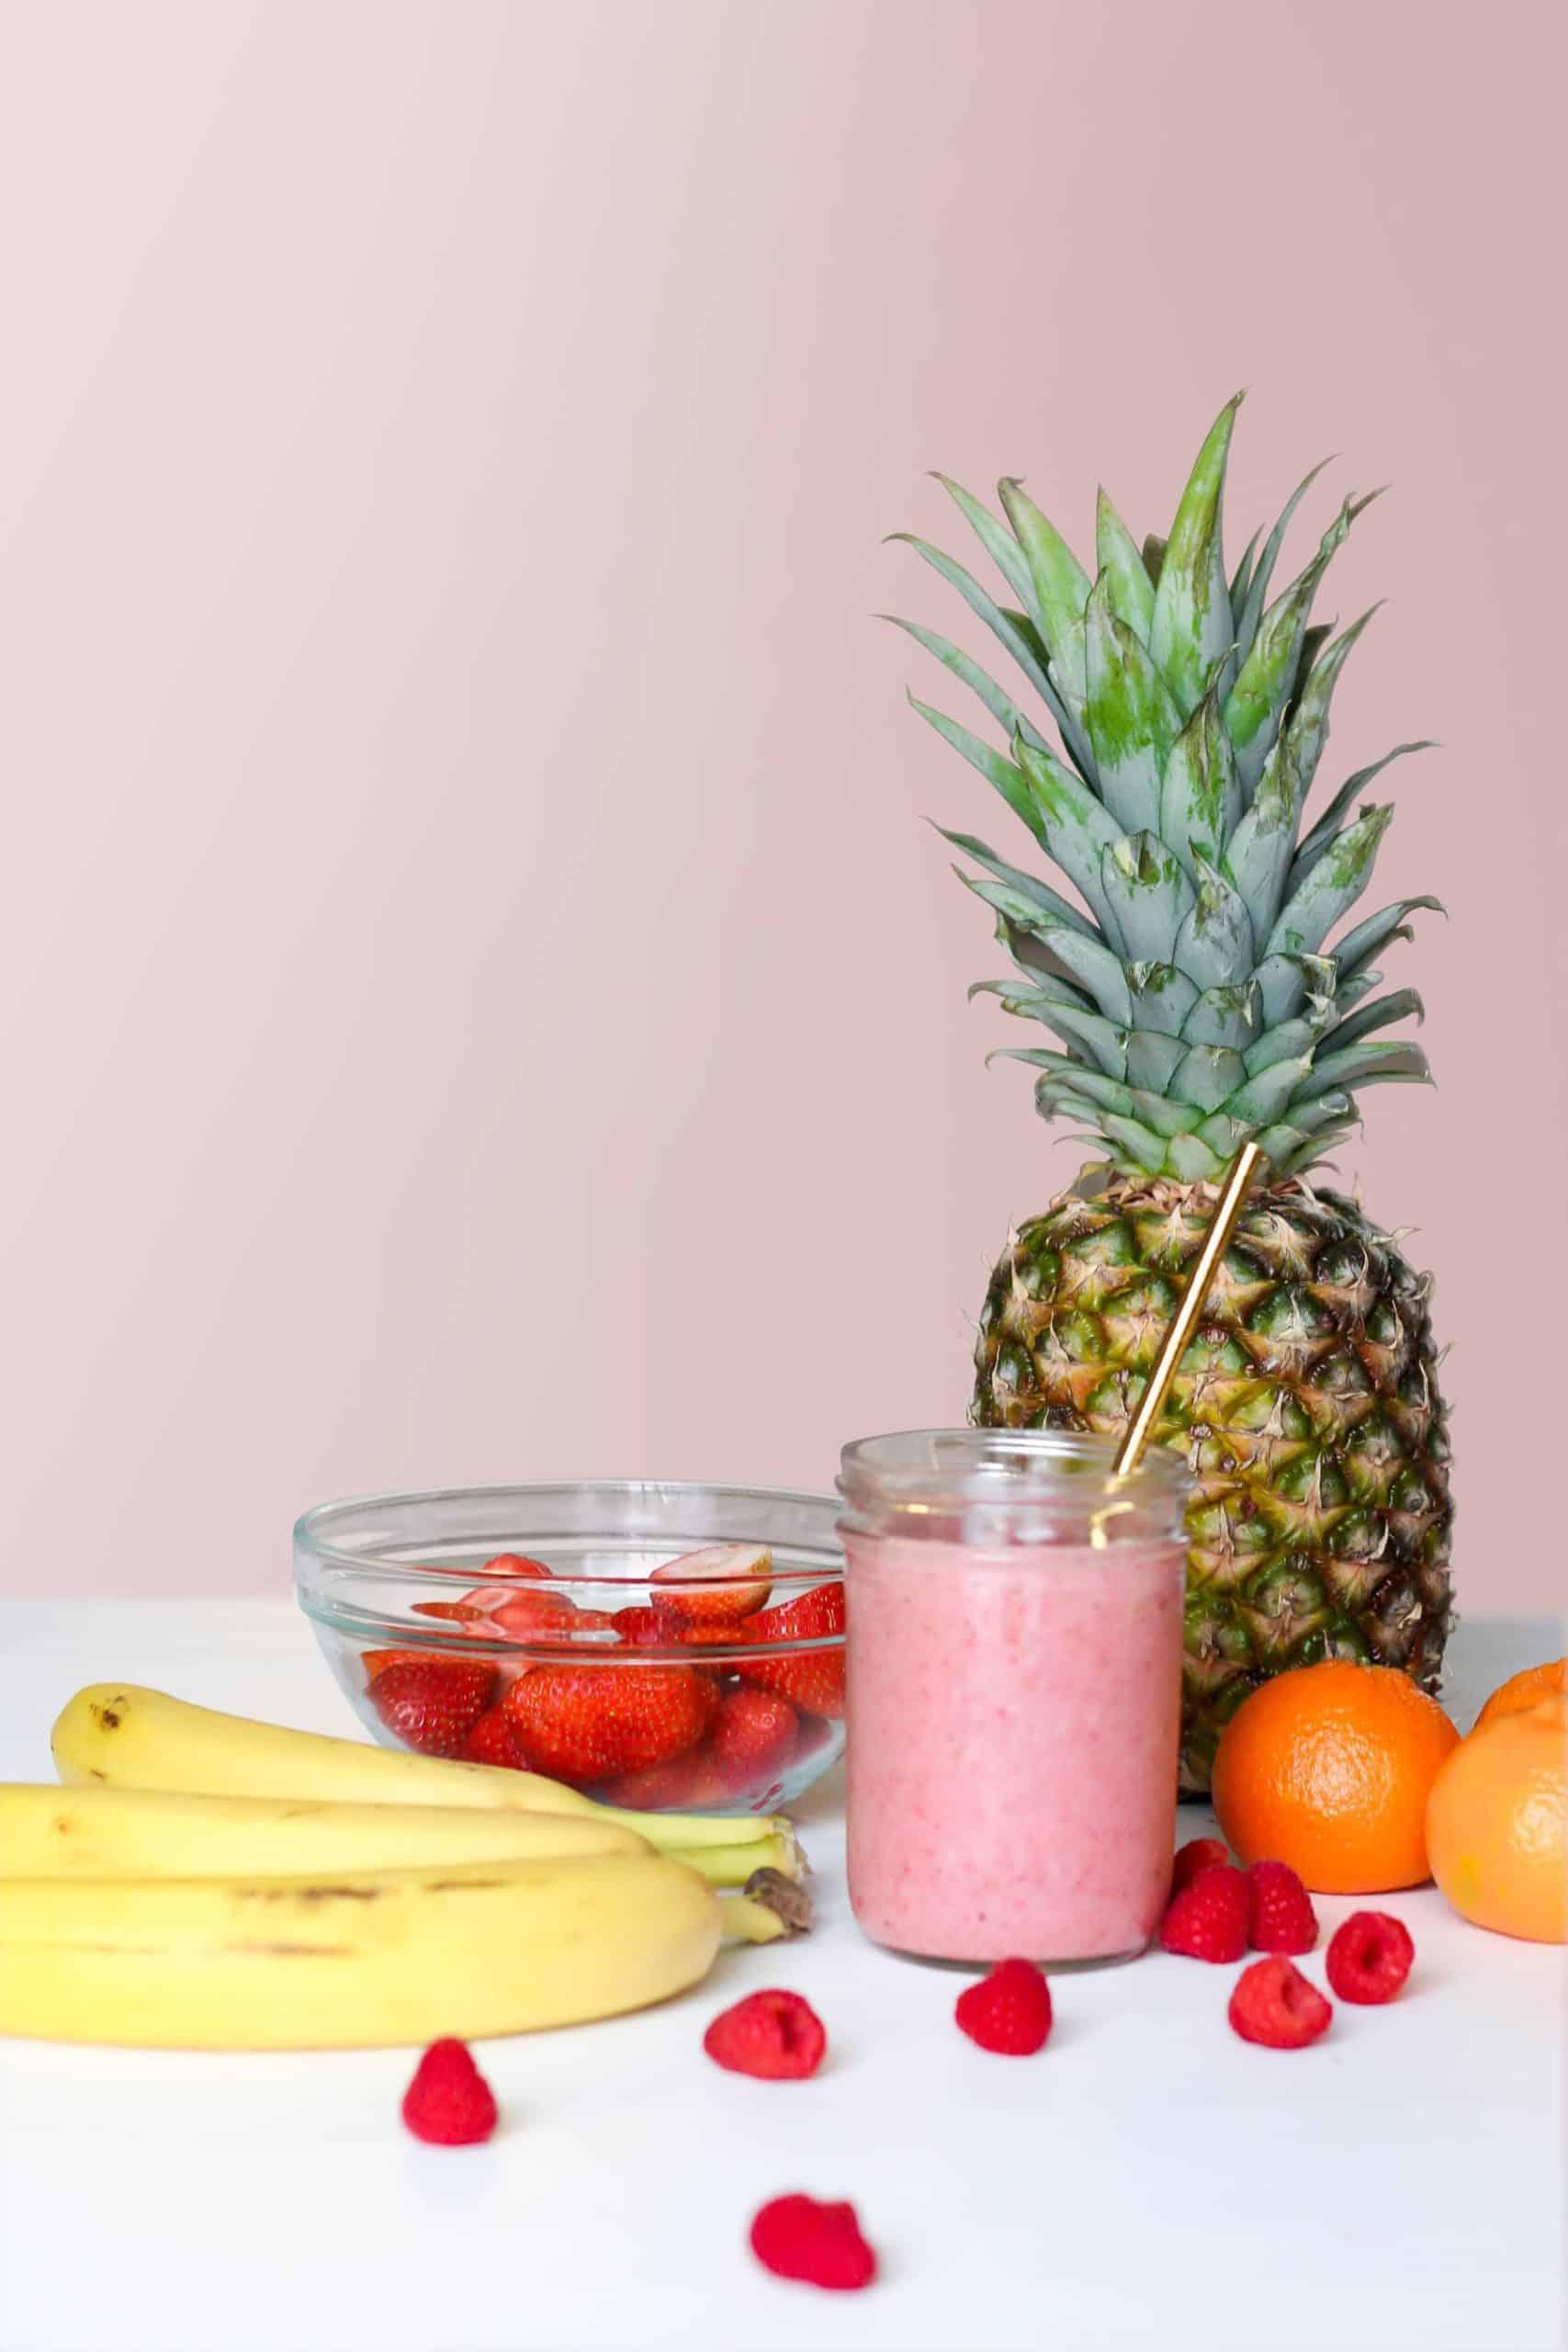 Pineapple Fruit, Banana made smoothies